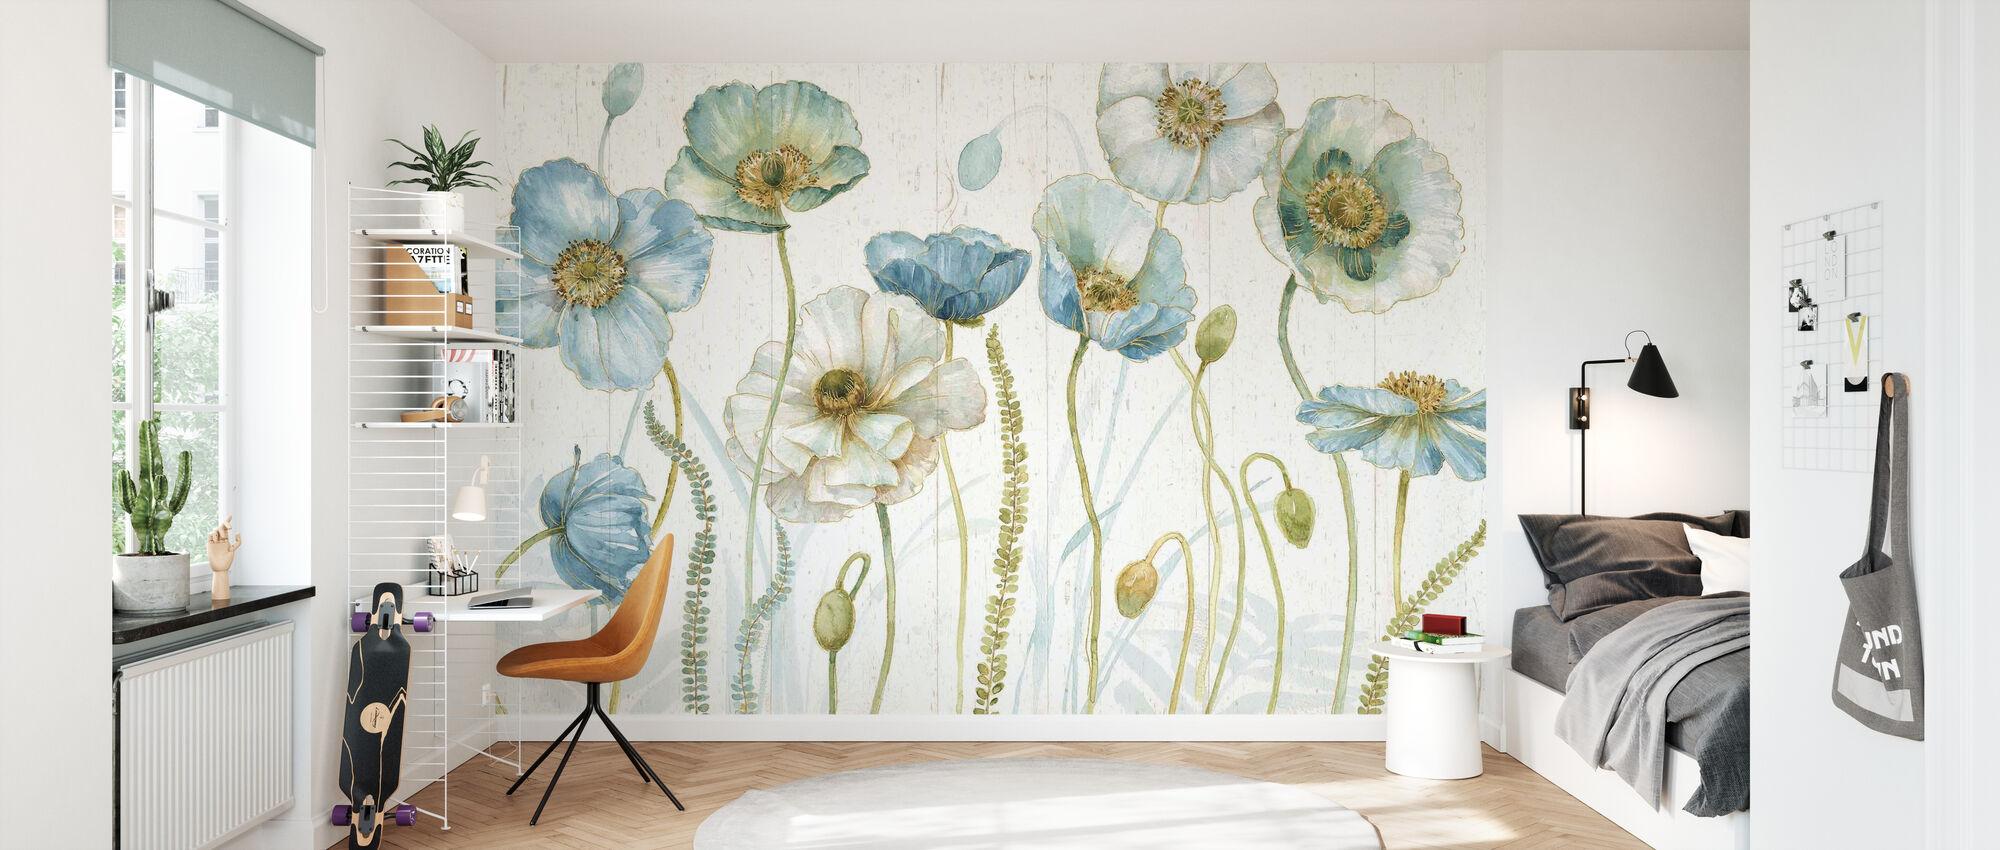 My Greenhouse Flowers on Wood - Wallpaper - Kids Room